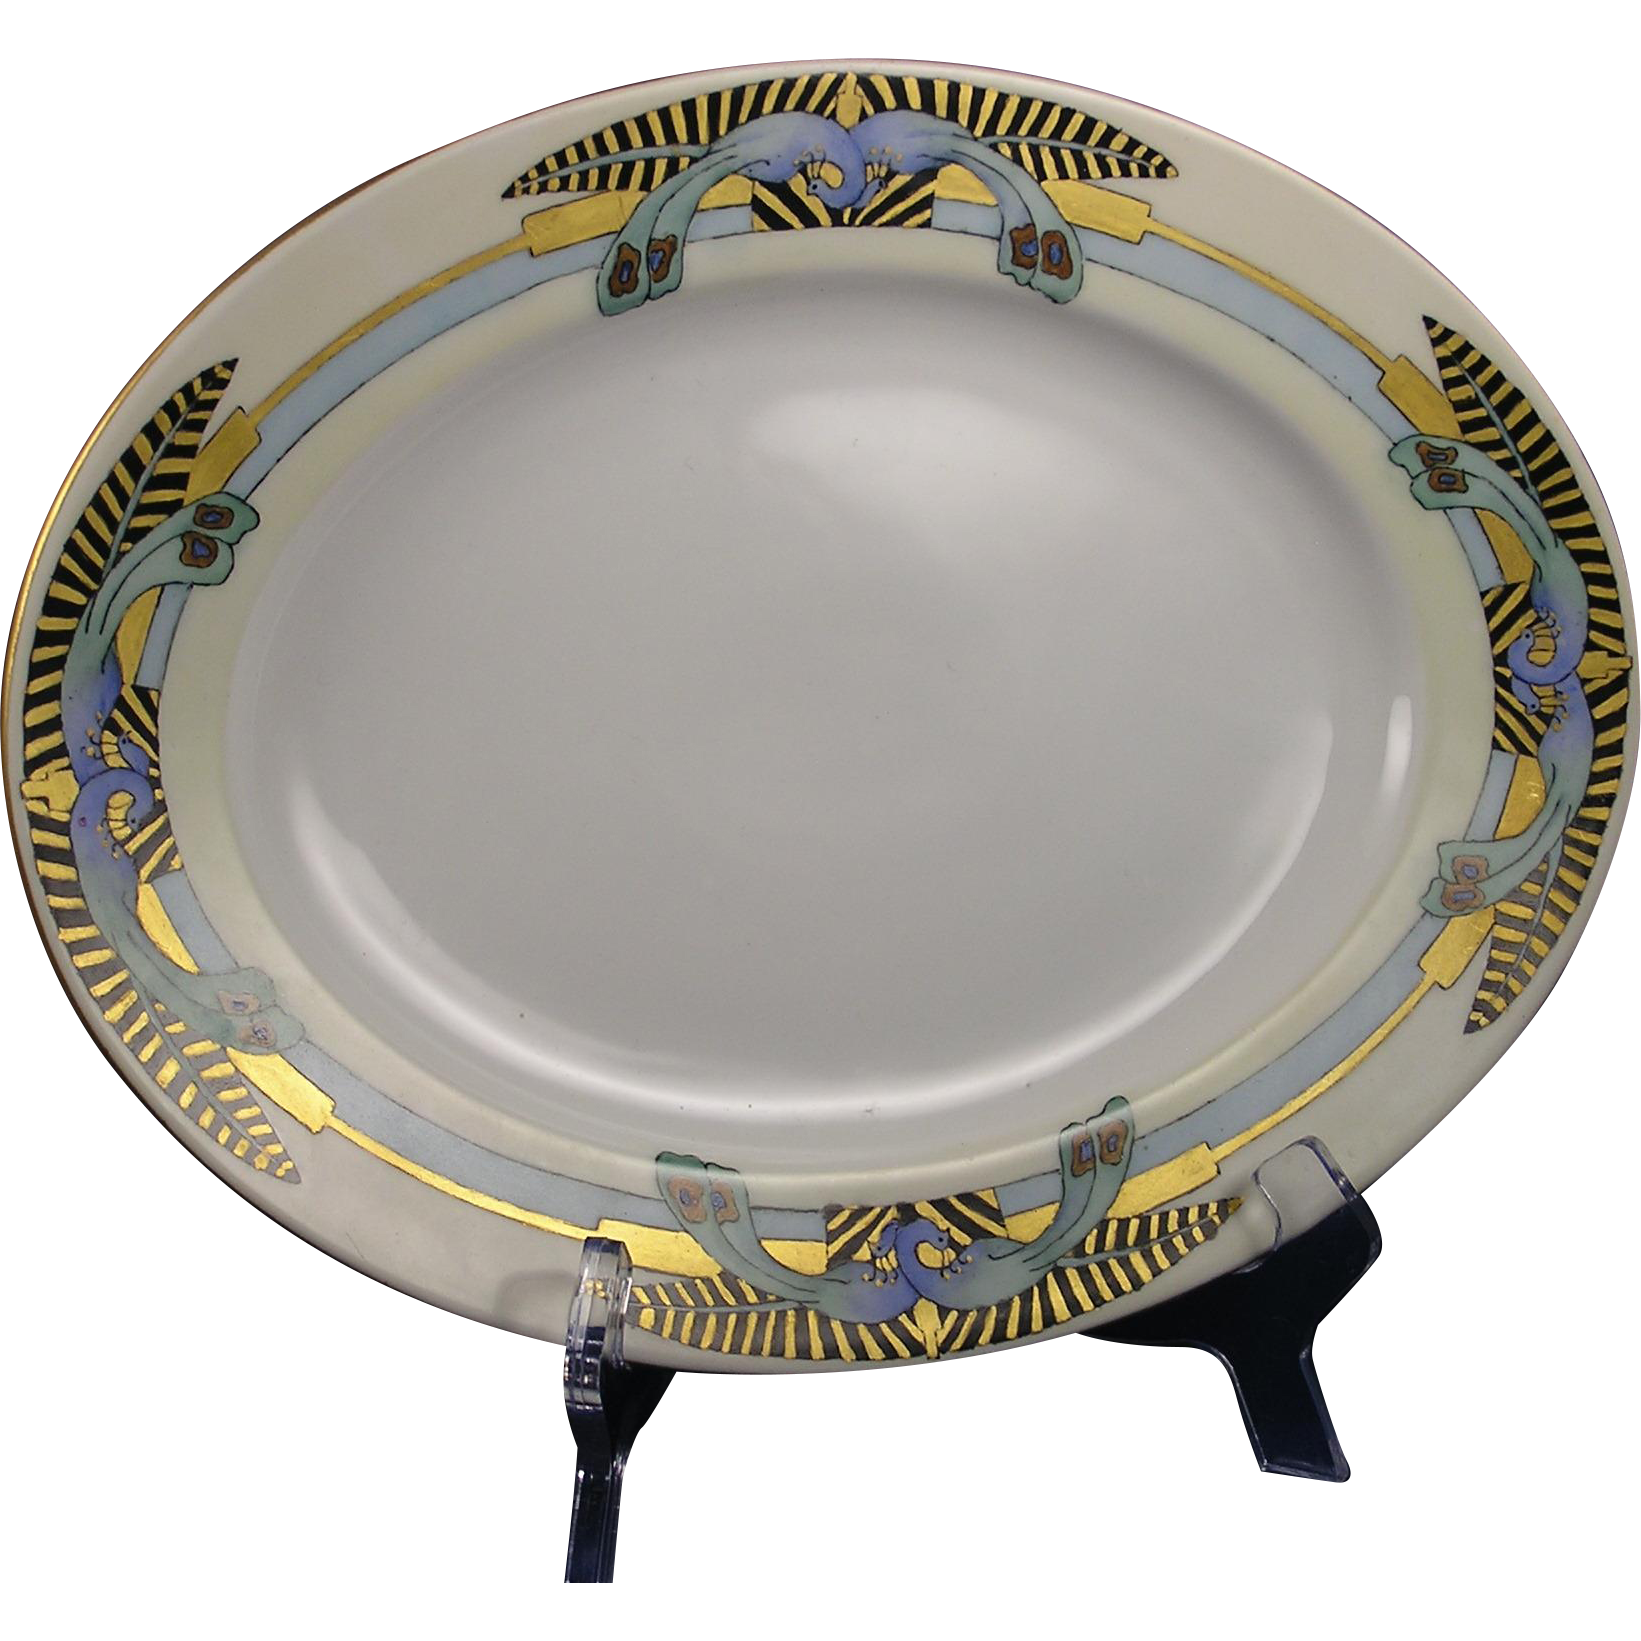 "Bohemia Ceramic Works Czecho-Slovakia Peacock Motif Serving Plate (Signed ""Maizie Meifert""/Dated 1947)"